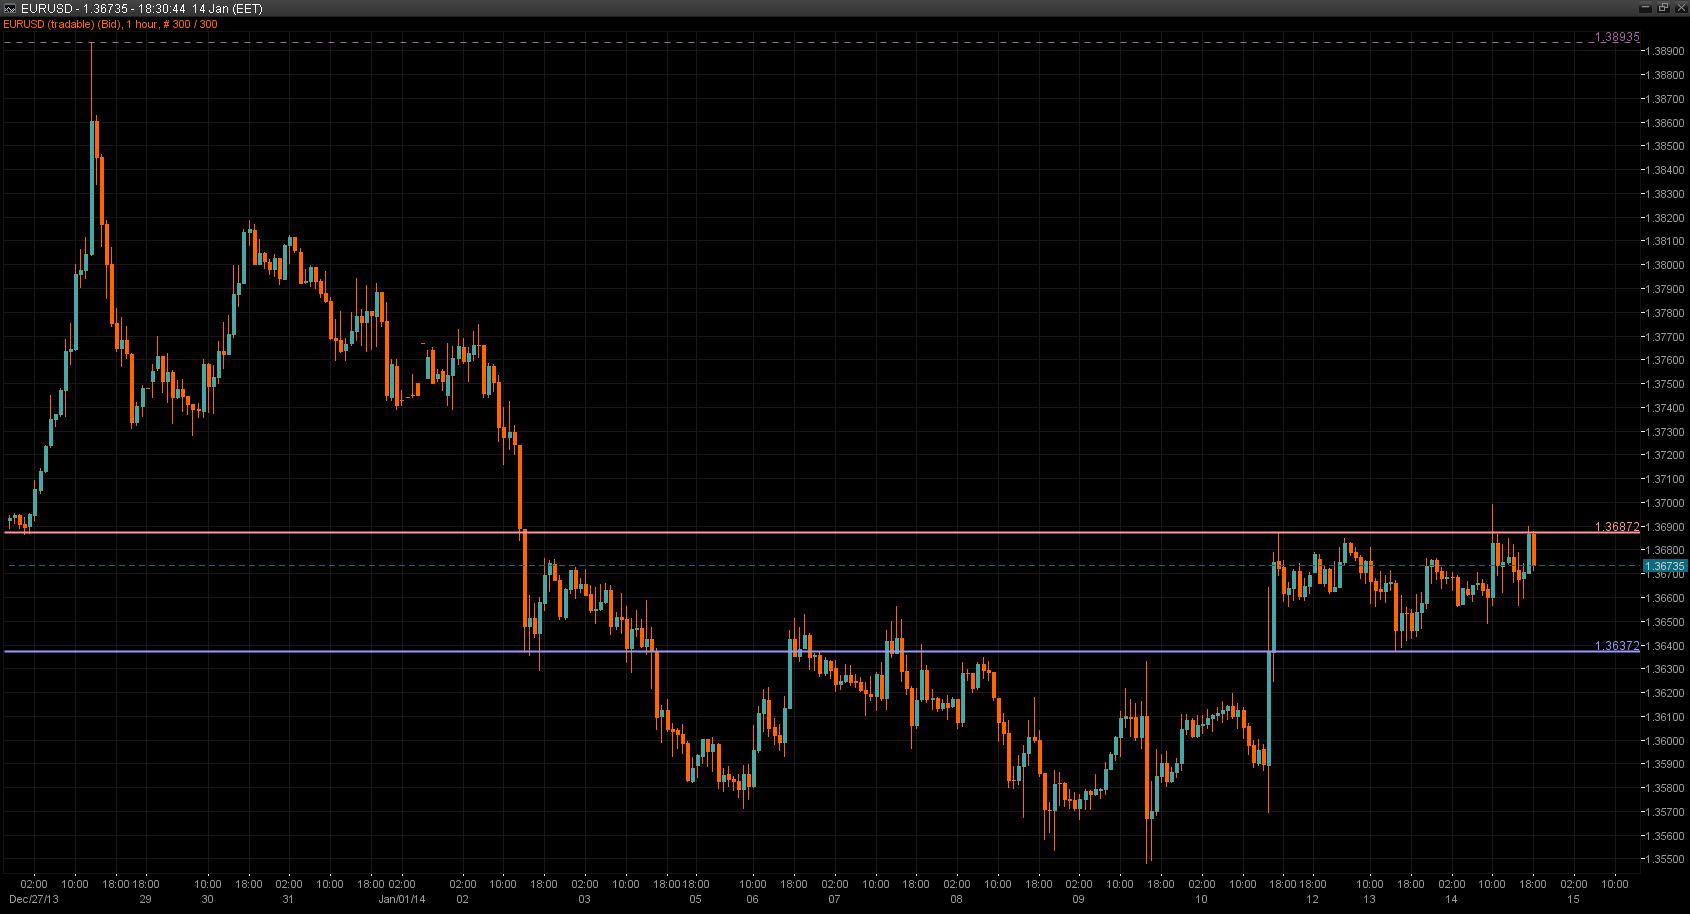 EUR/USD Chart 14 Jan 2014